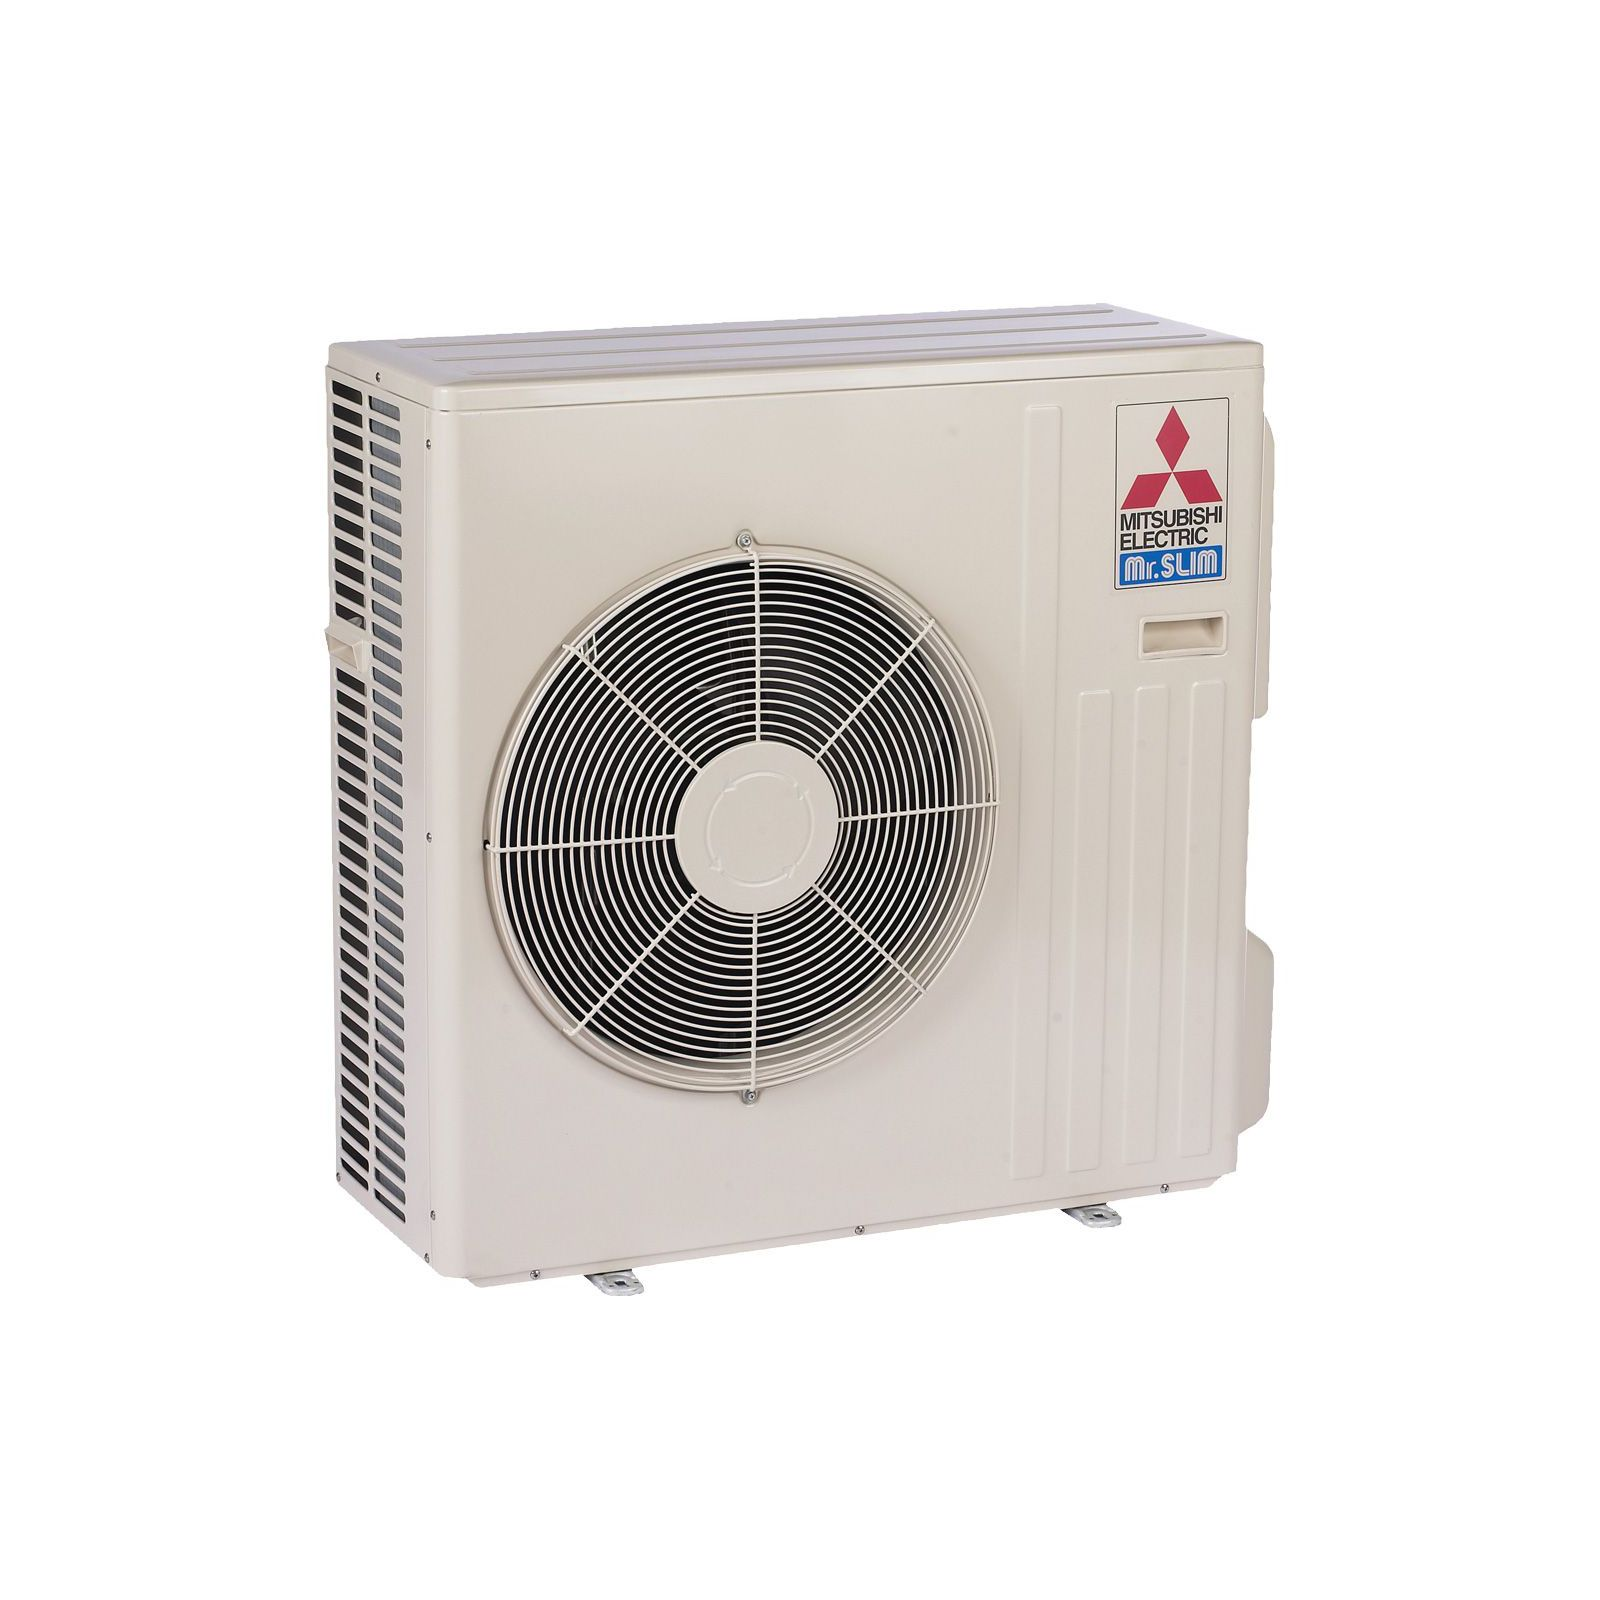 Mitsubishi MUY-D36NA-1 - M-Series Outdoor Air Conditioner, Inverter-driven,  36K BTU, R410A